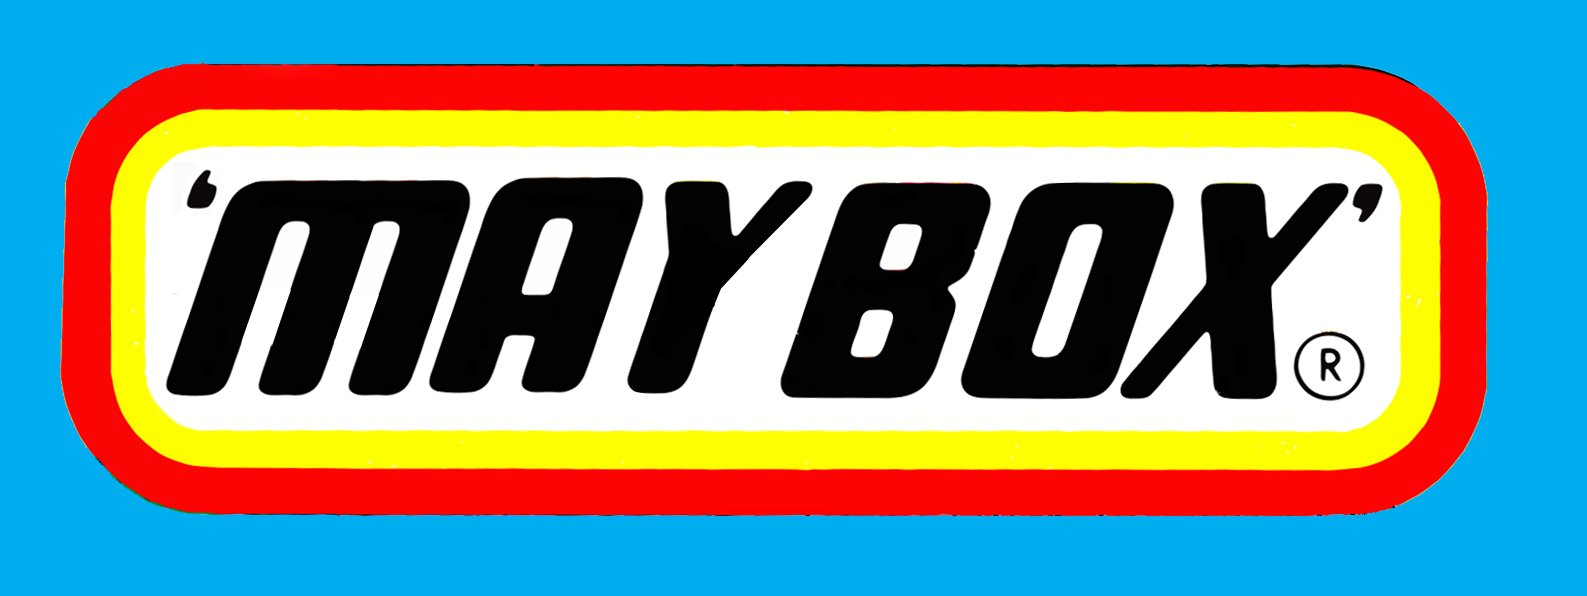 http://www.bentcop.biz/Maybox.png